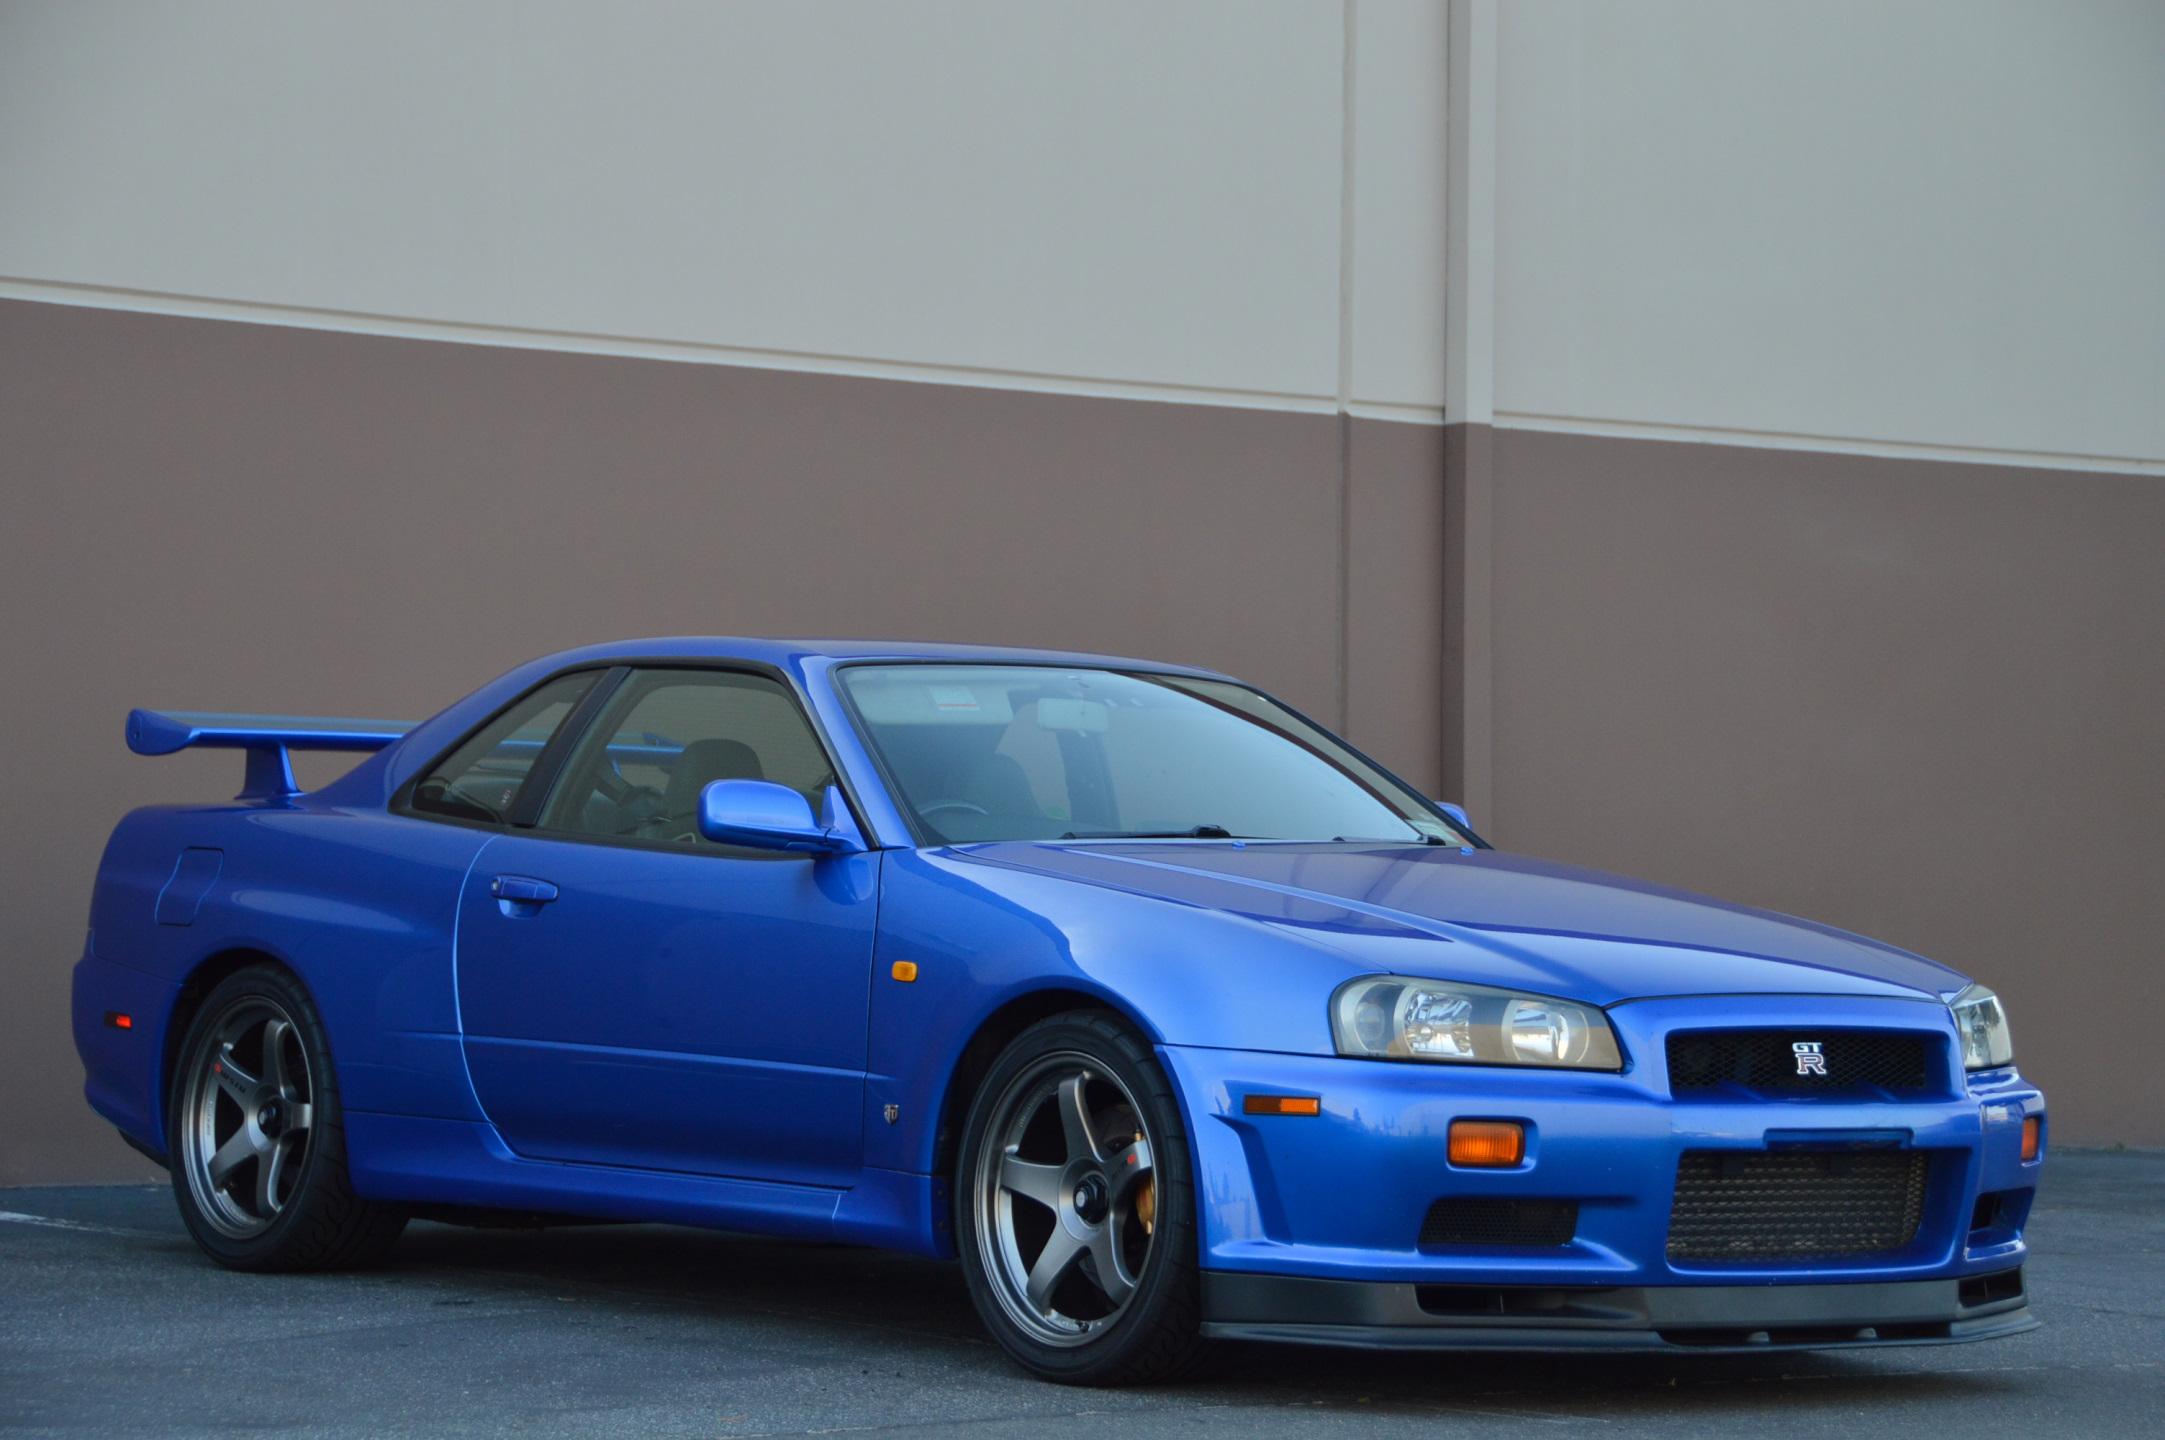 MotoRex R34 Nissan Skyline GT-R US Legal